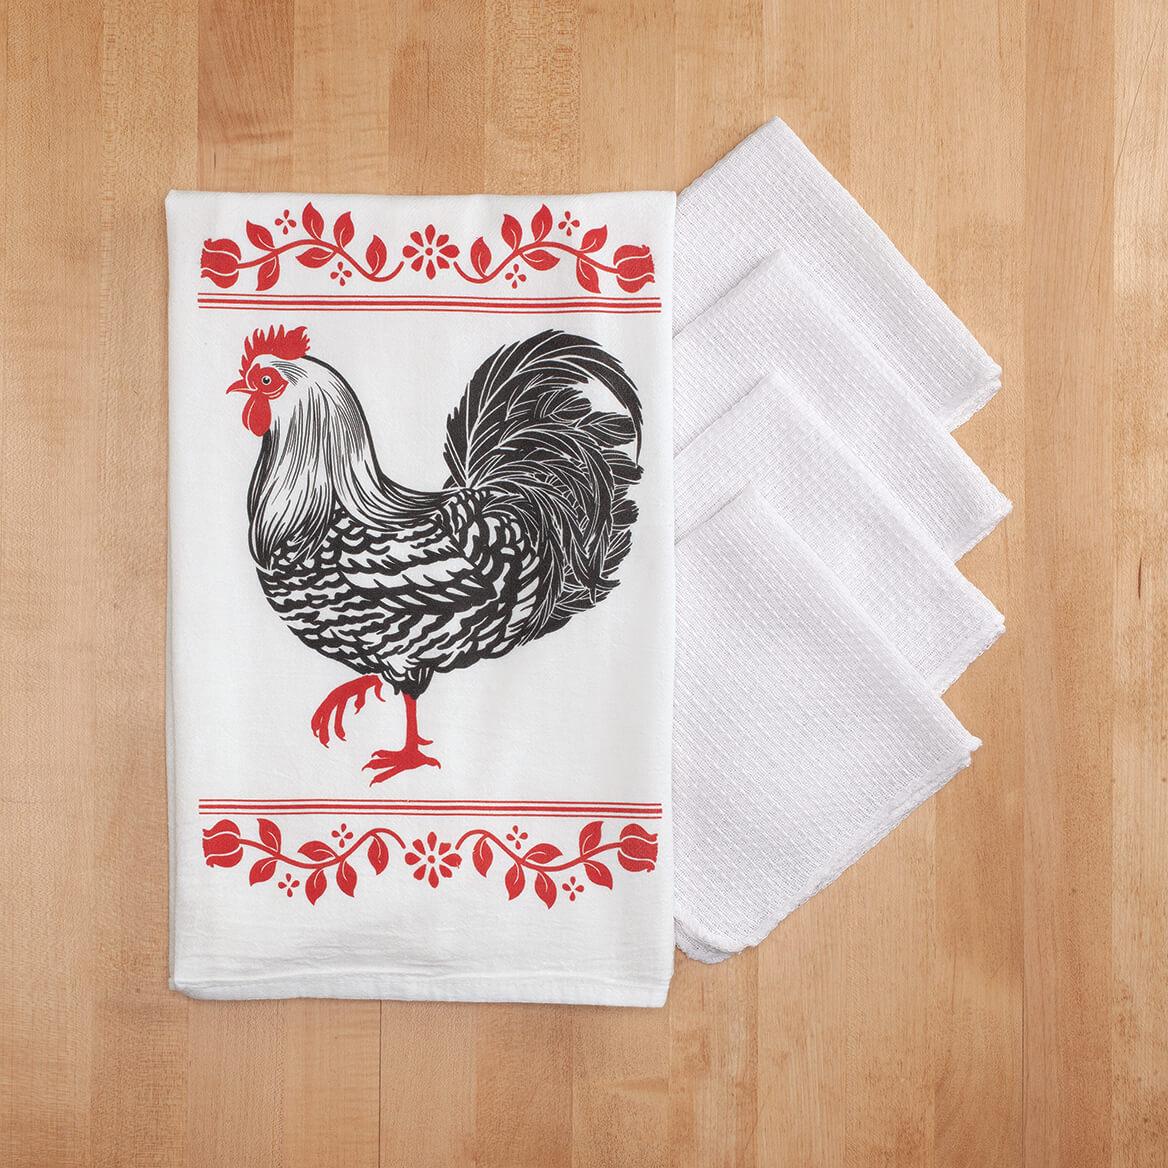 Barnyard Flour Sack & Utility Kitchen Towel Set-368401